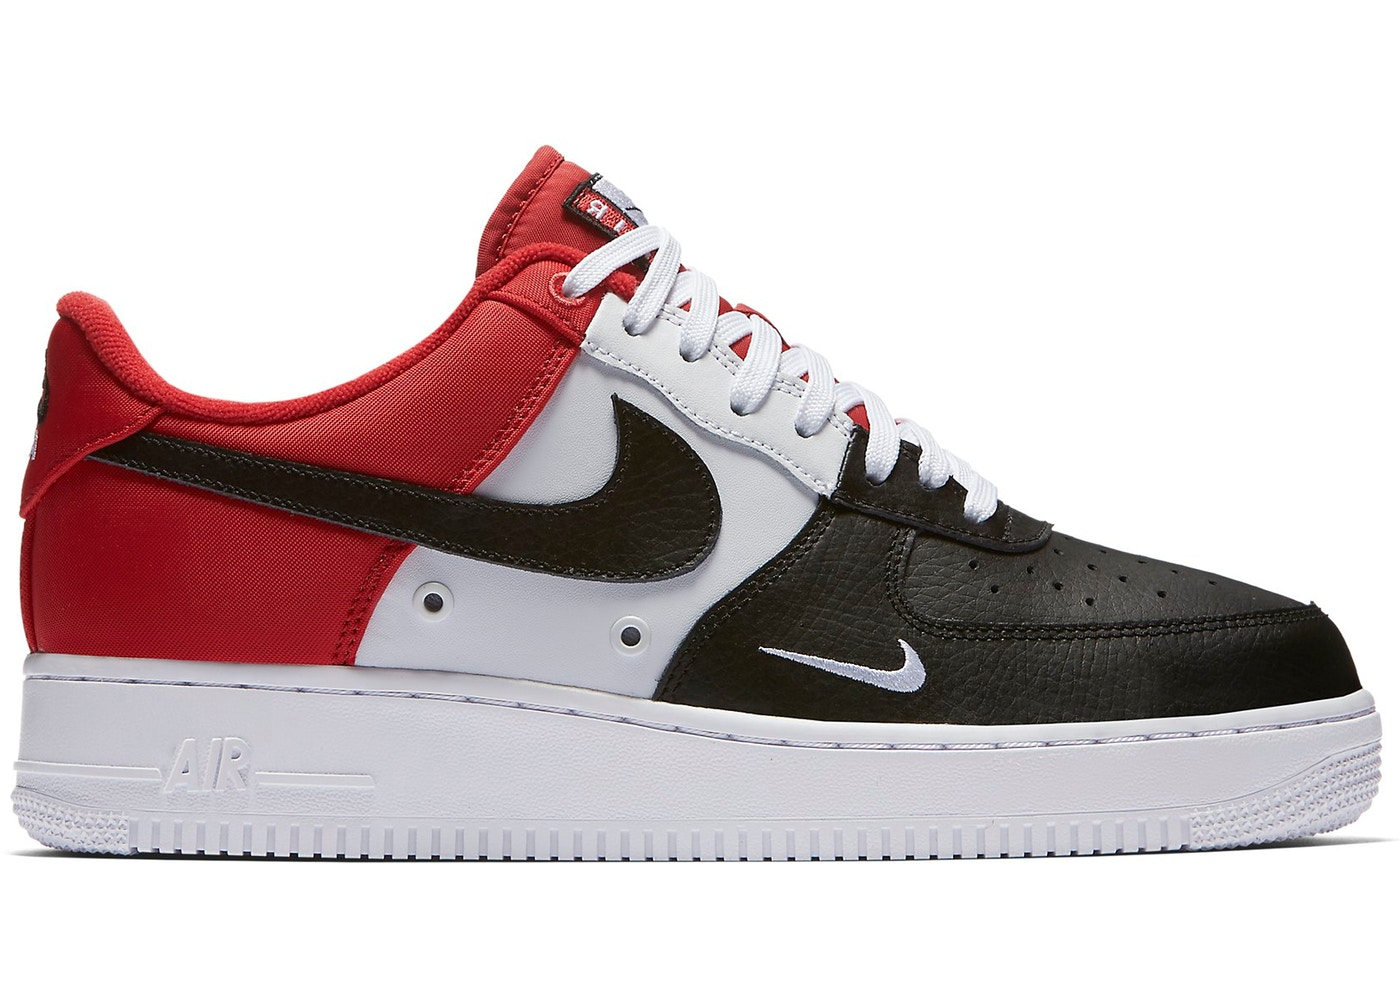 Nike Air Force 1 Low Black Toe (Mini Swoosh)